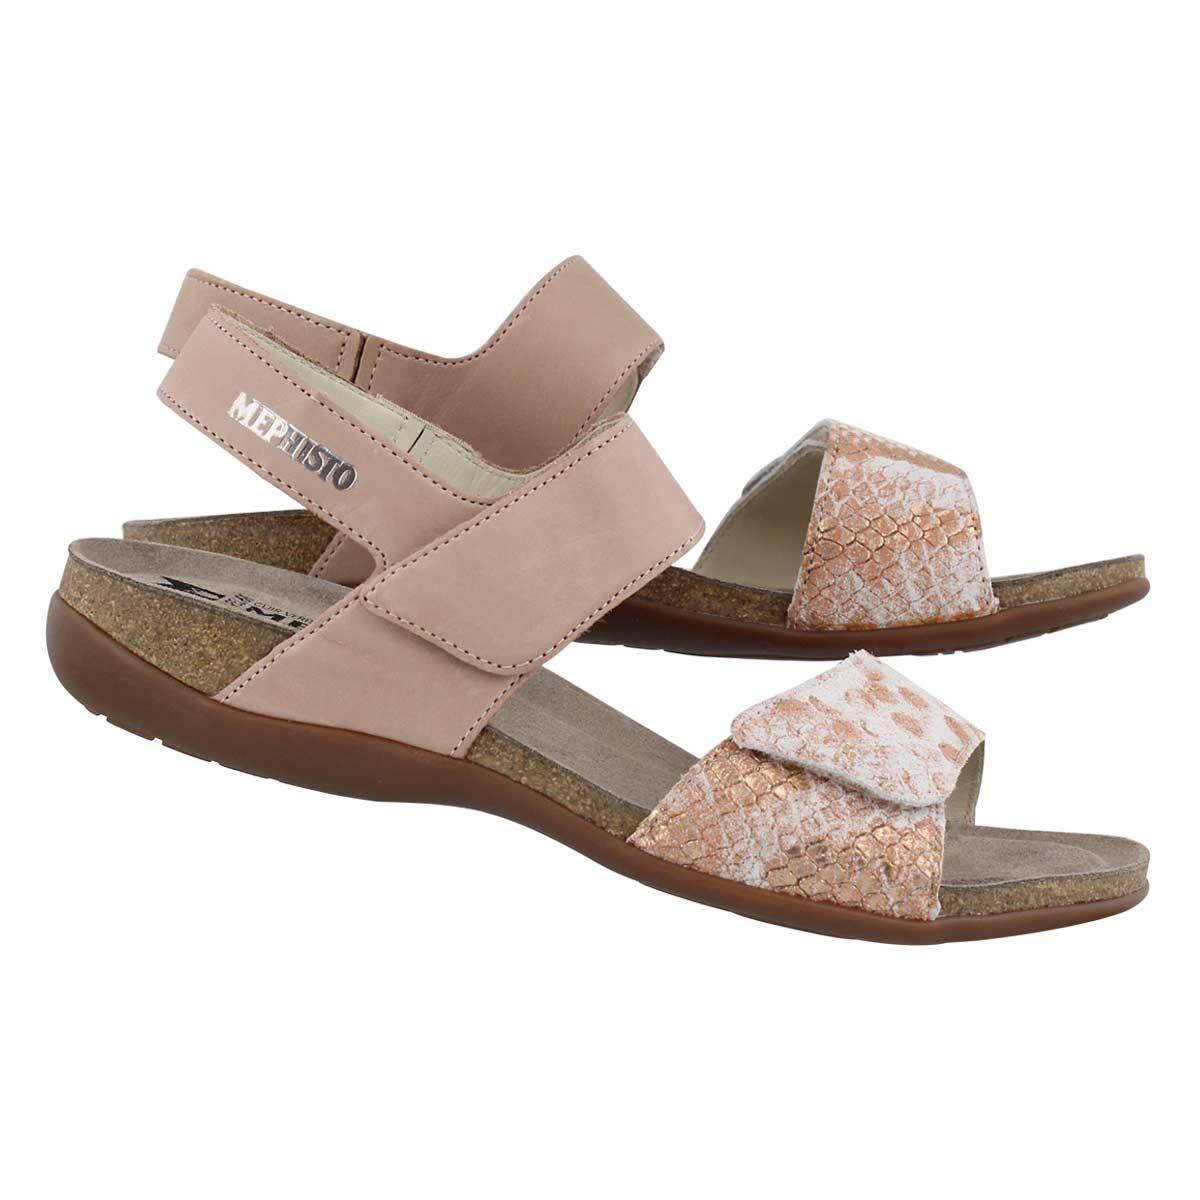 Lds Agave nude cork footbed sandal